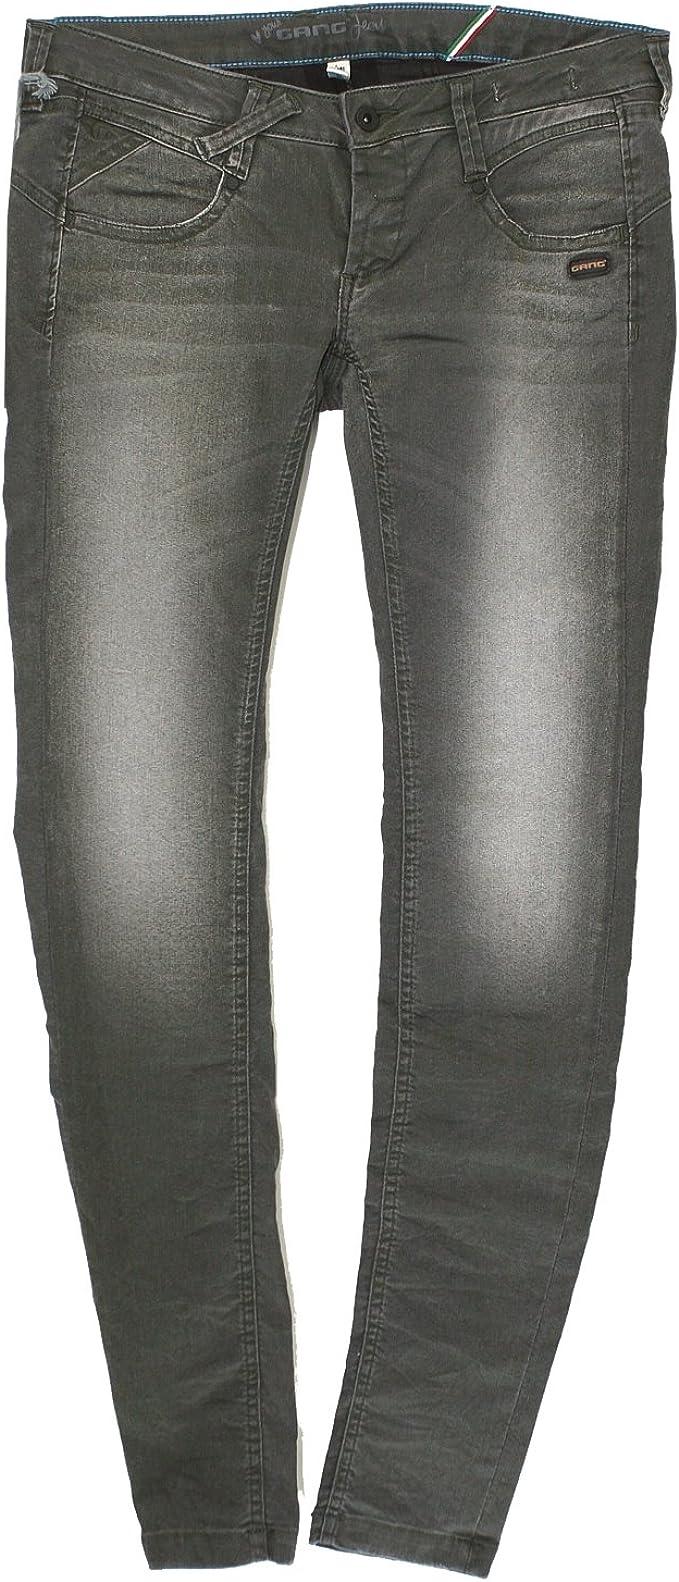 "grün Gang Damen Marken-Jeans /""FAYE/"""